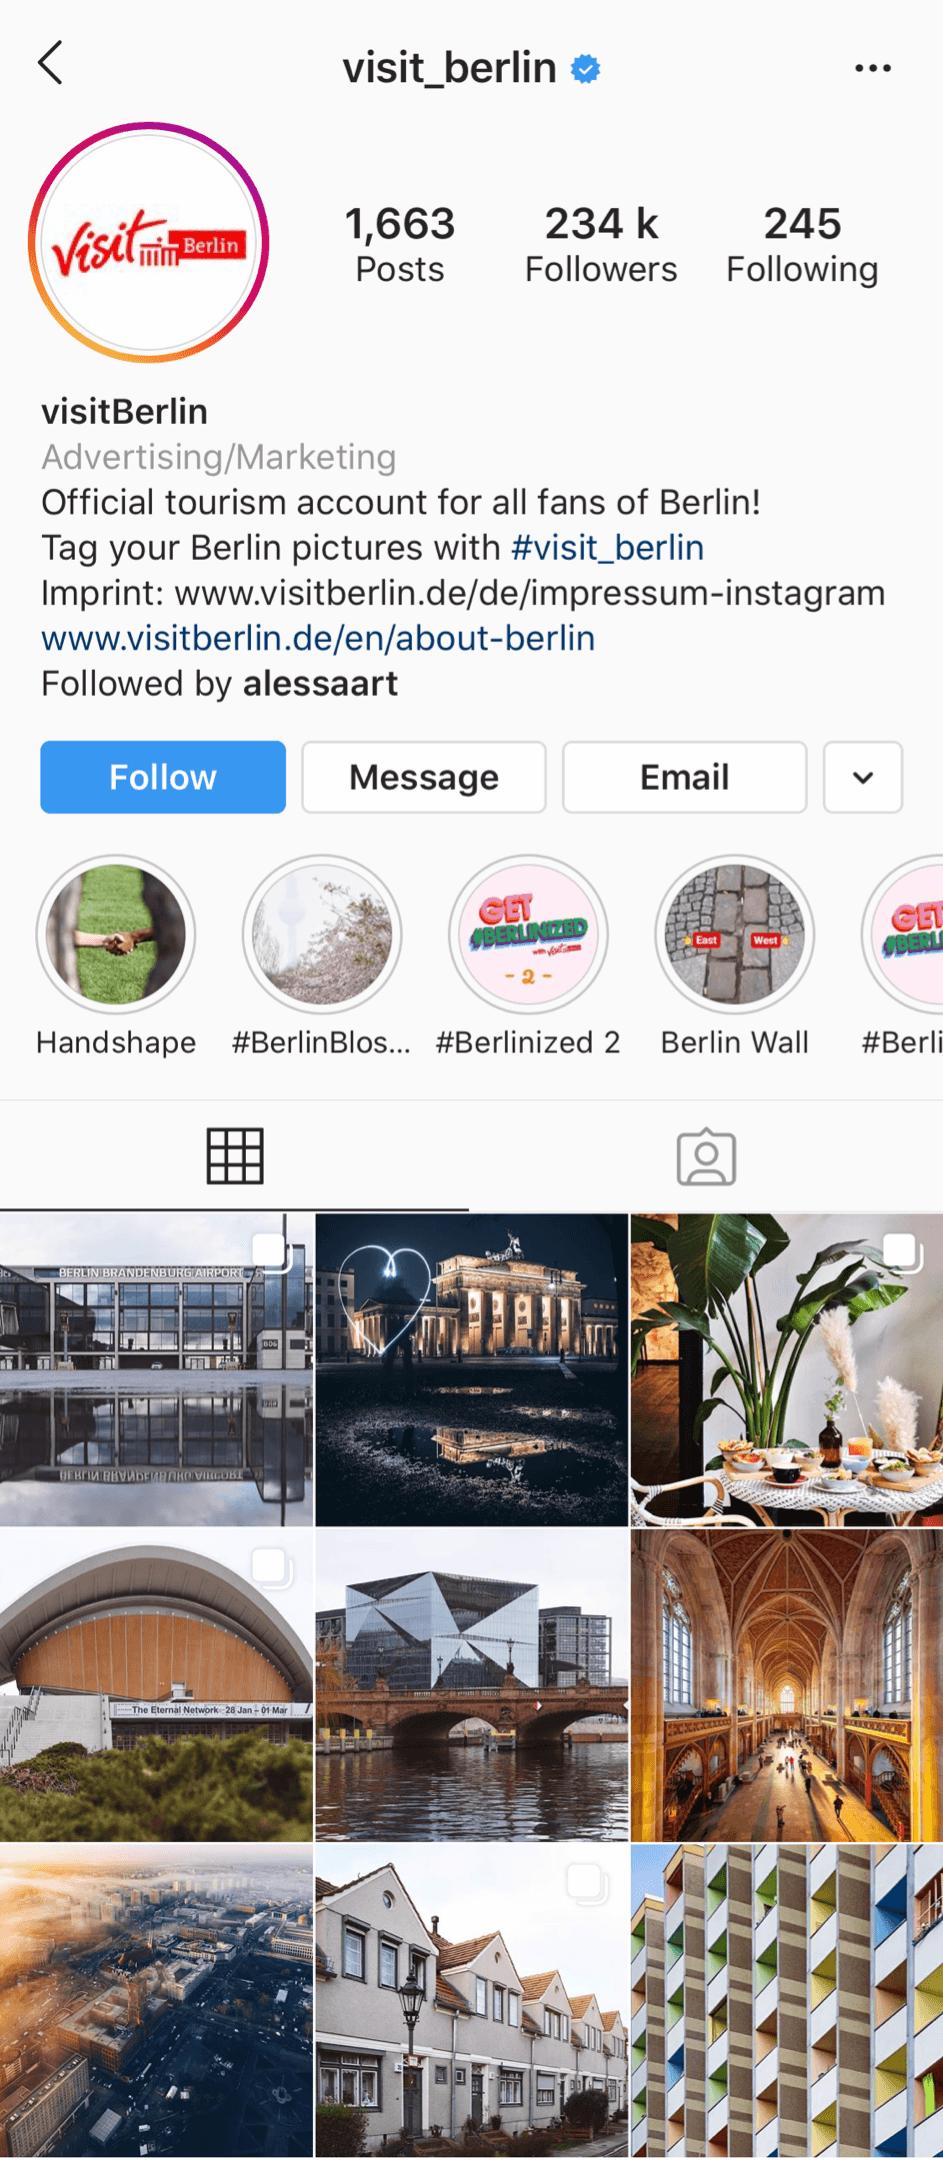 @visit_berlin verified Instagram account